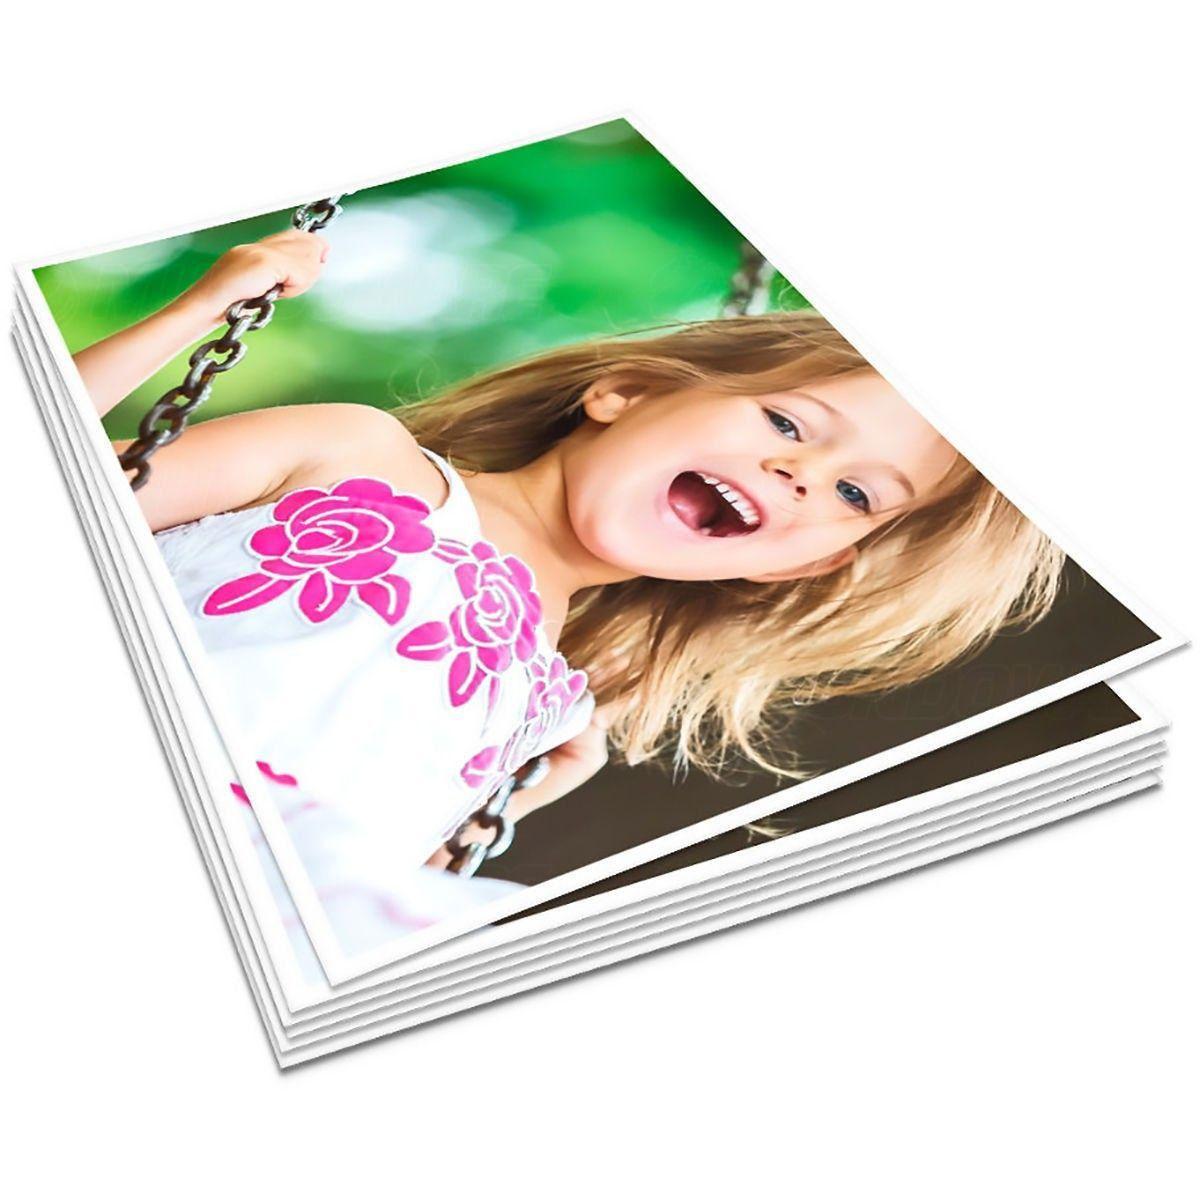 Papel Fotográfico 150g A4  50 Folhas